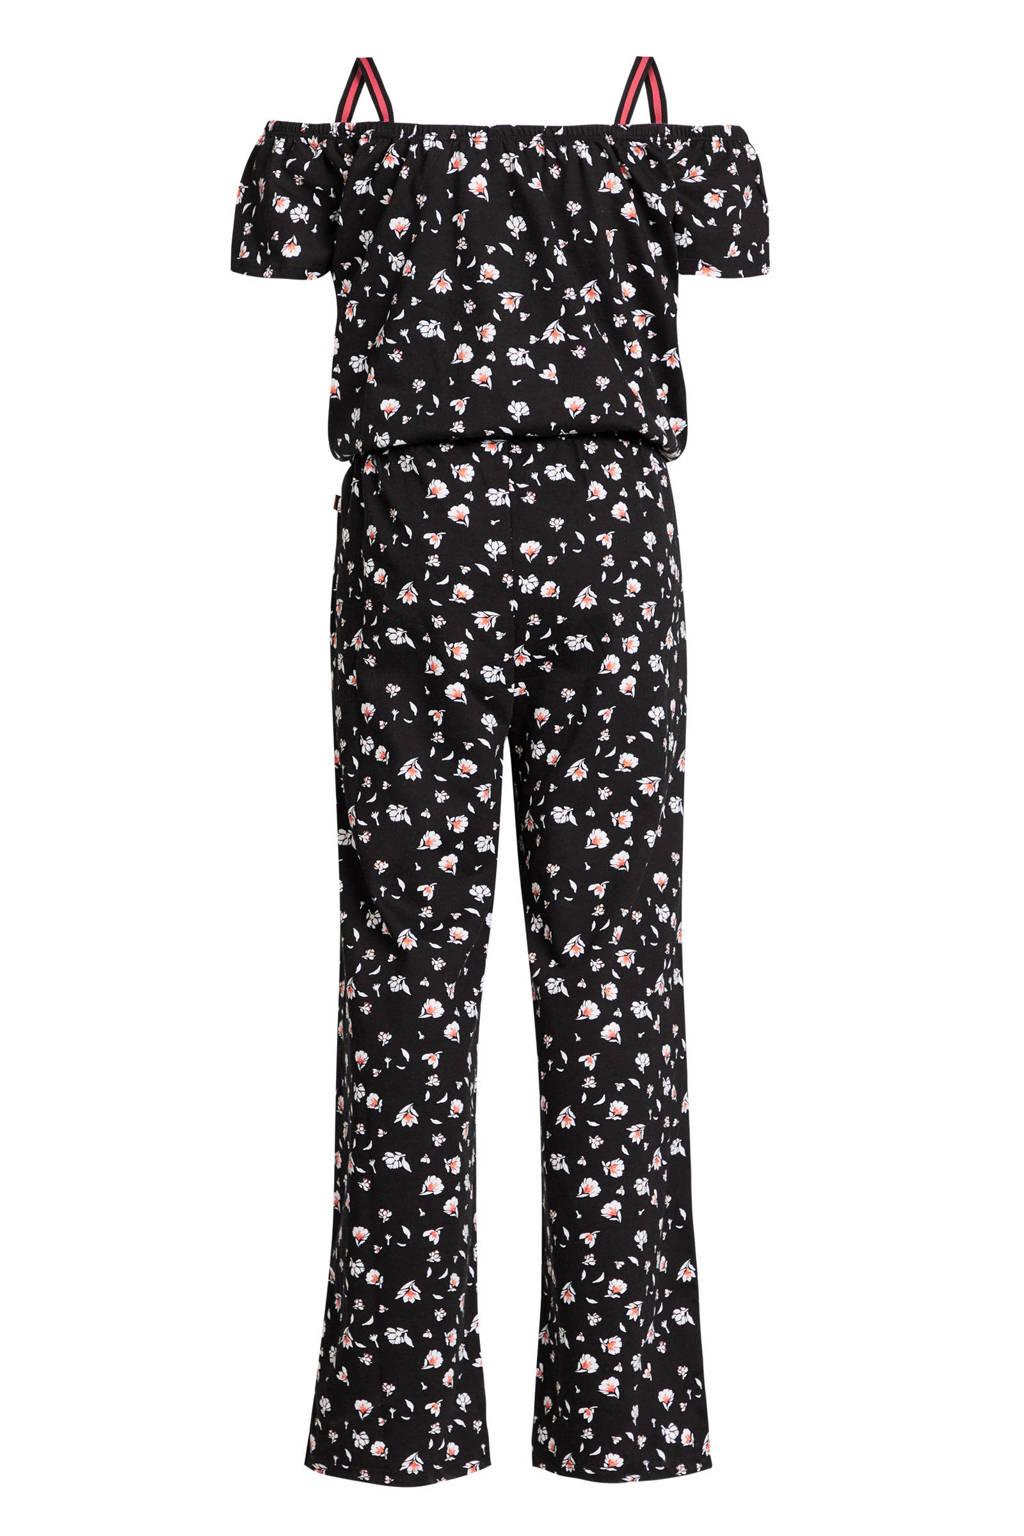 WE Fashion gebloemde off shoulder jumpsuit zwart/roze/wit, Zwart/roze/wit